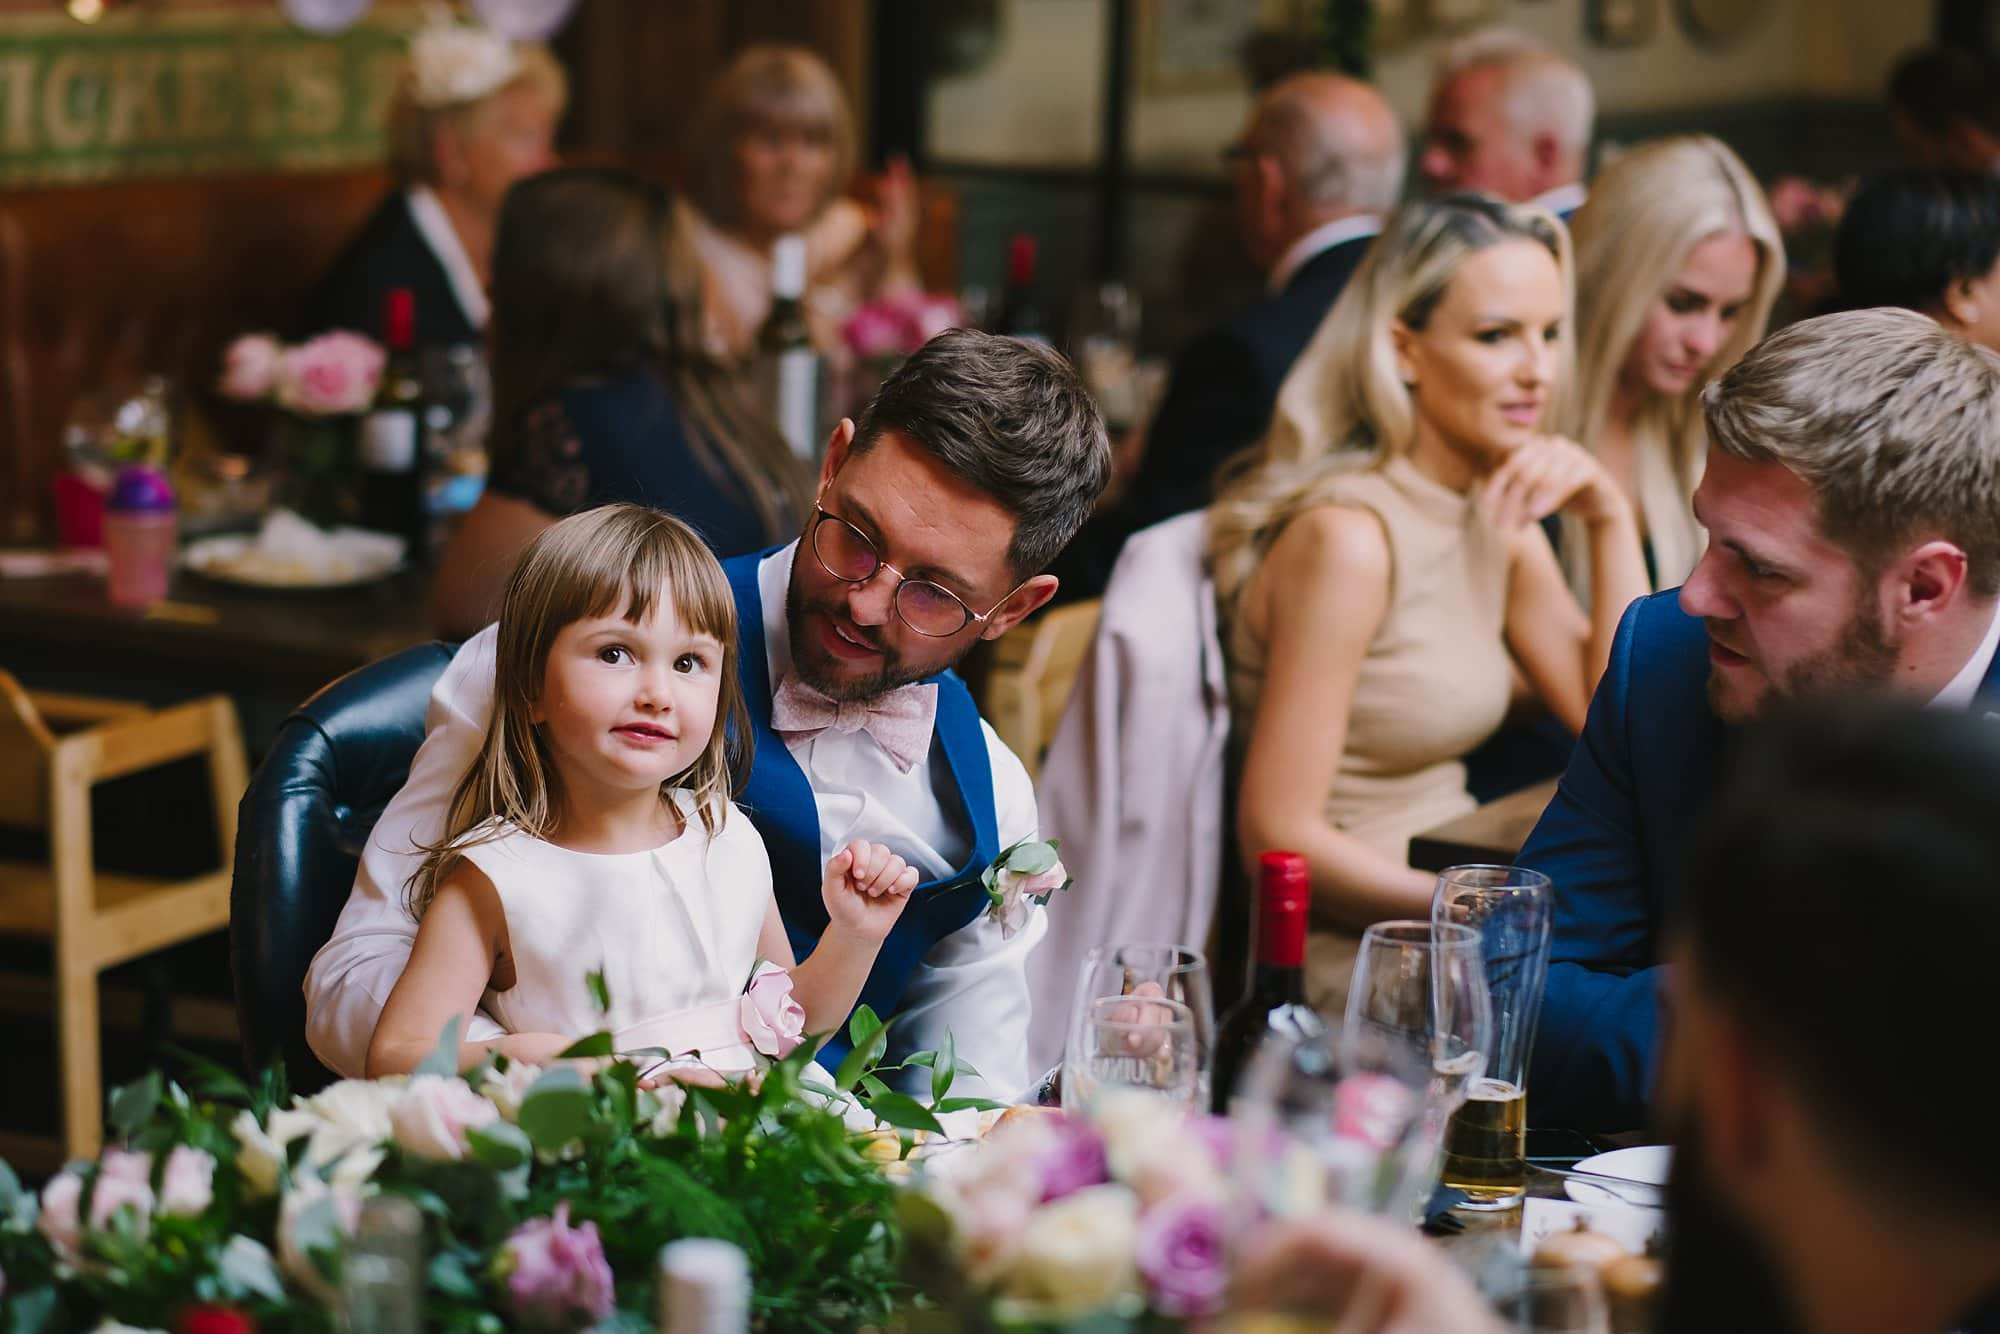 london pub wedding photographer jn 034 - The County Arms Wedding Photographer   Jen & Nick